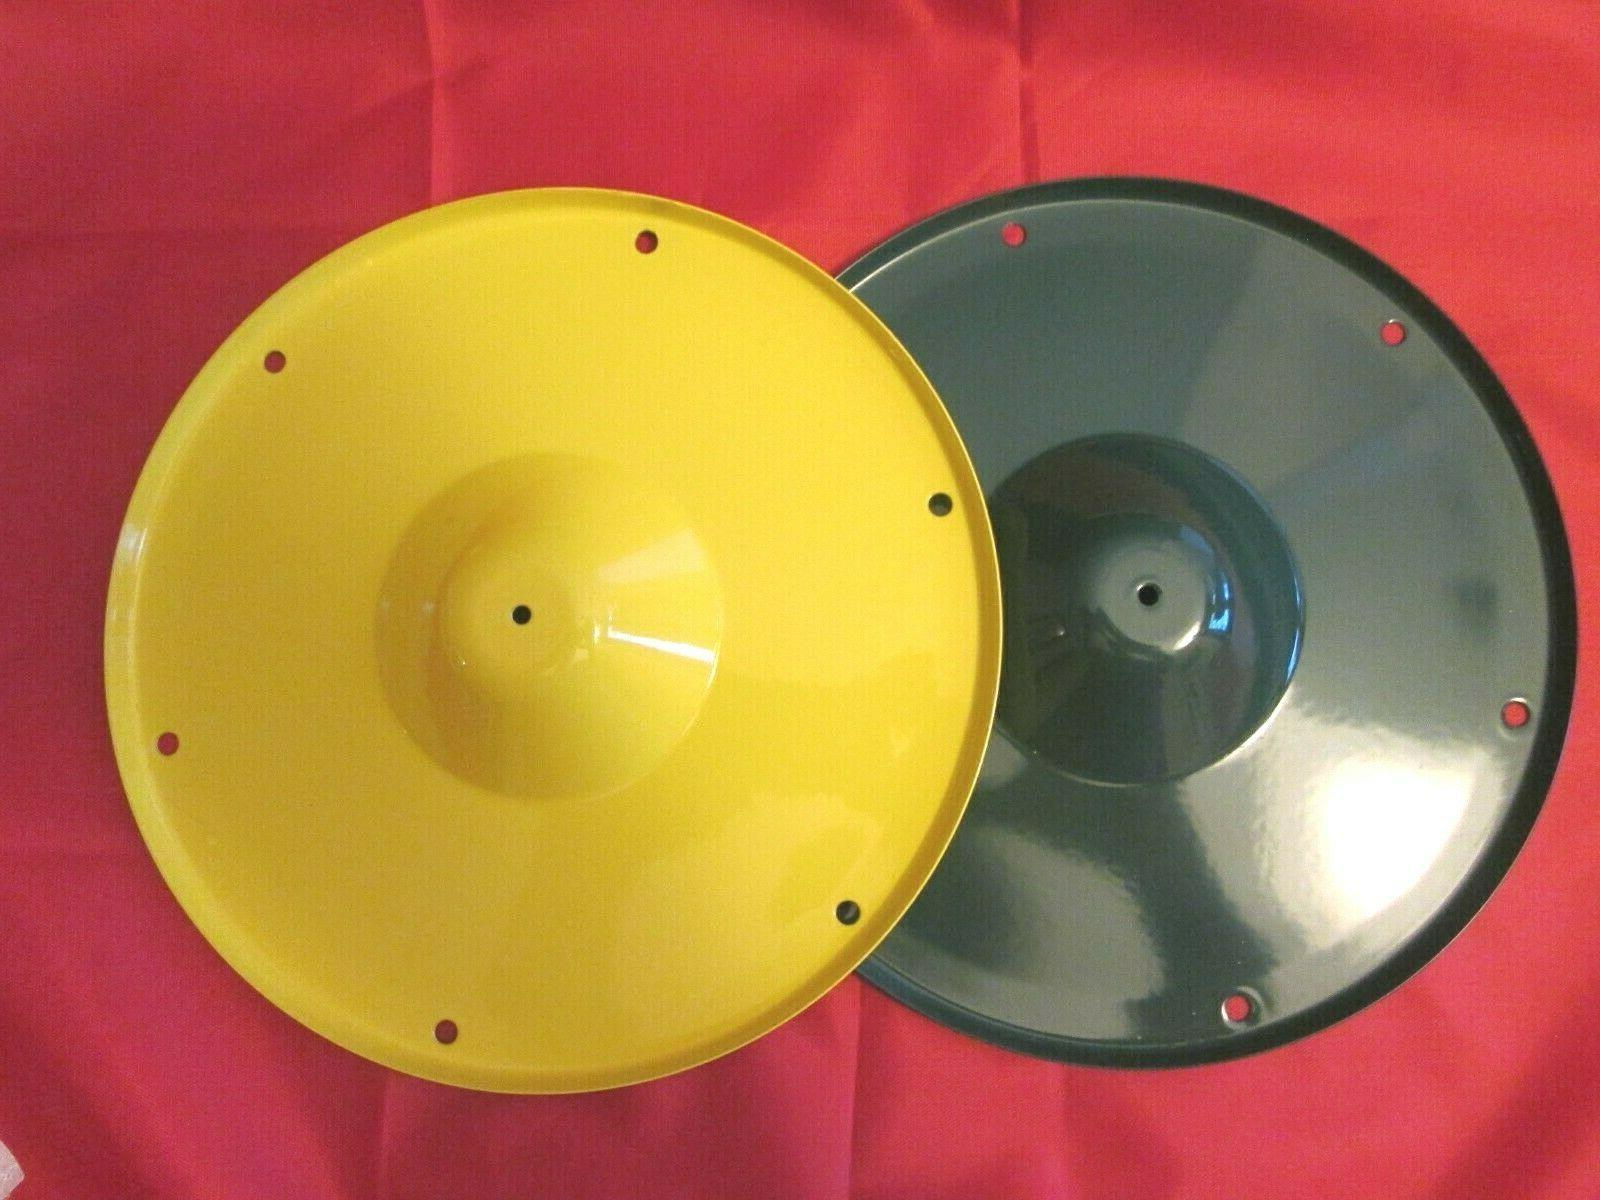 Seed tray, Add-on, Tube Style Bird Feeder, Green or Yellow